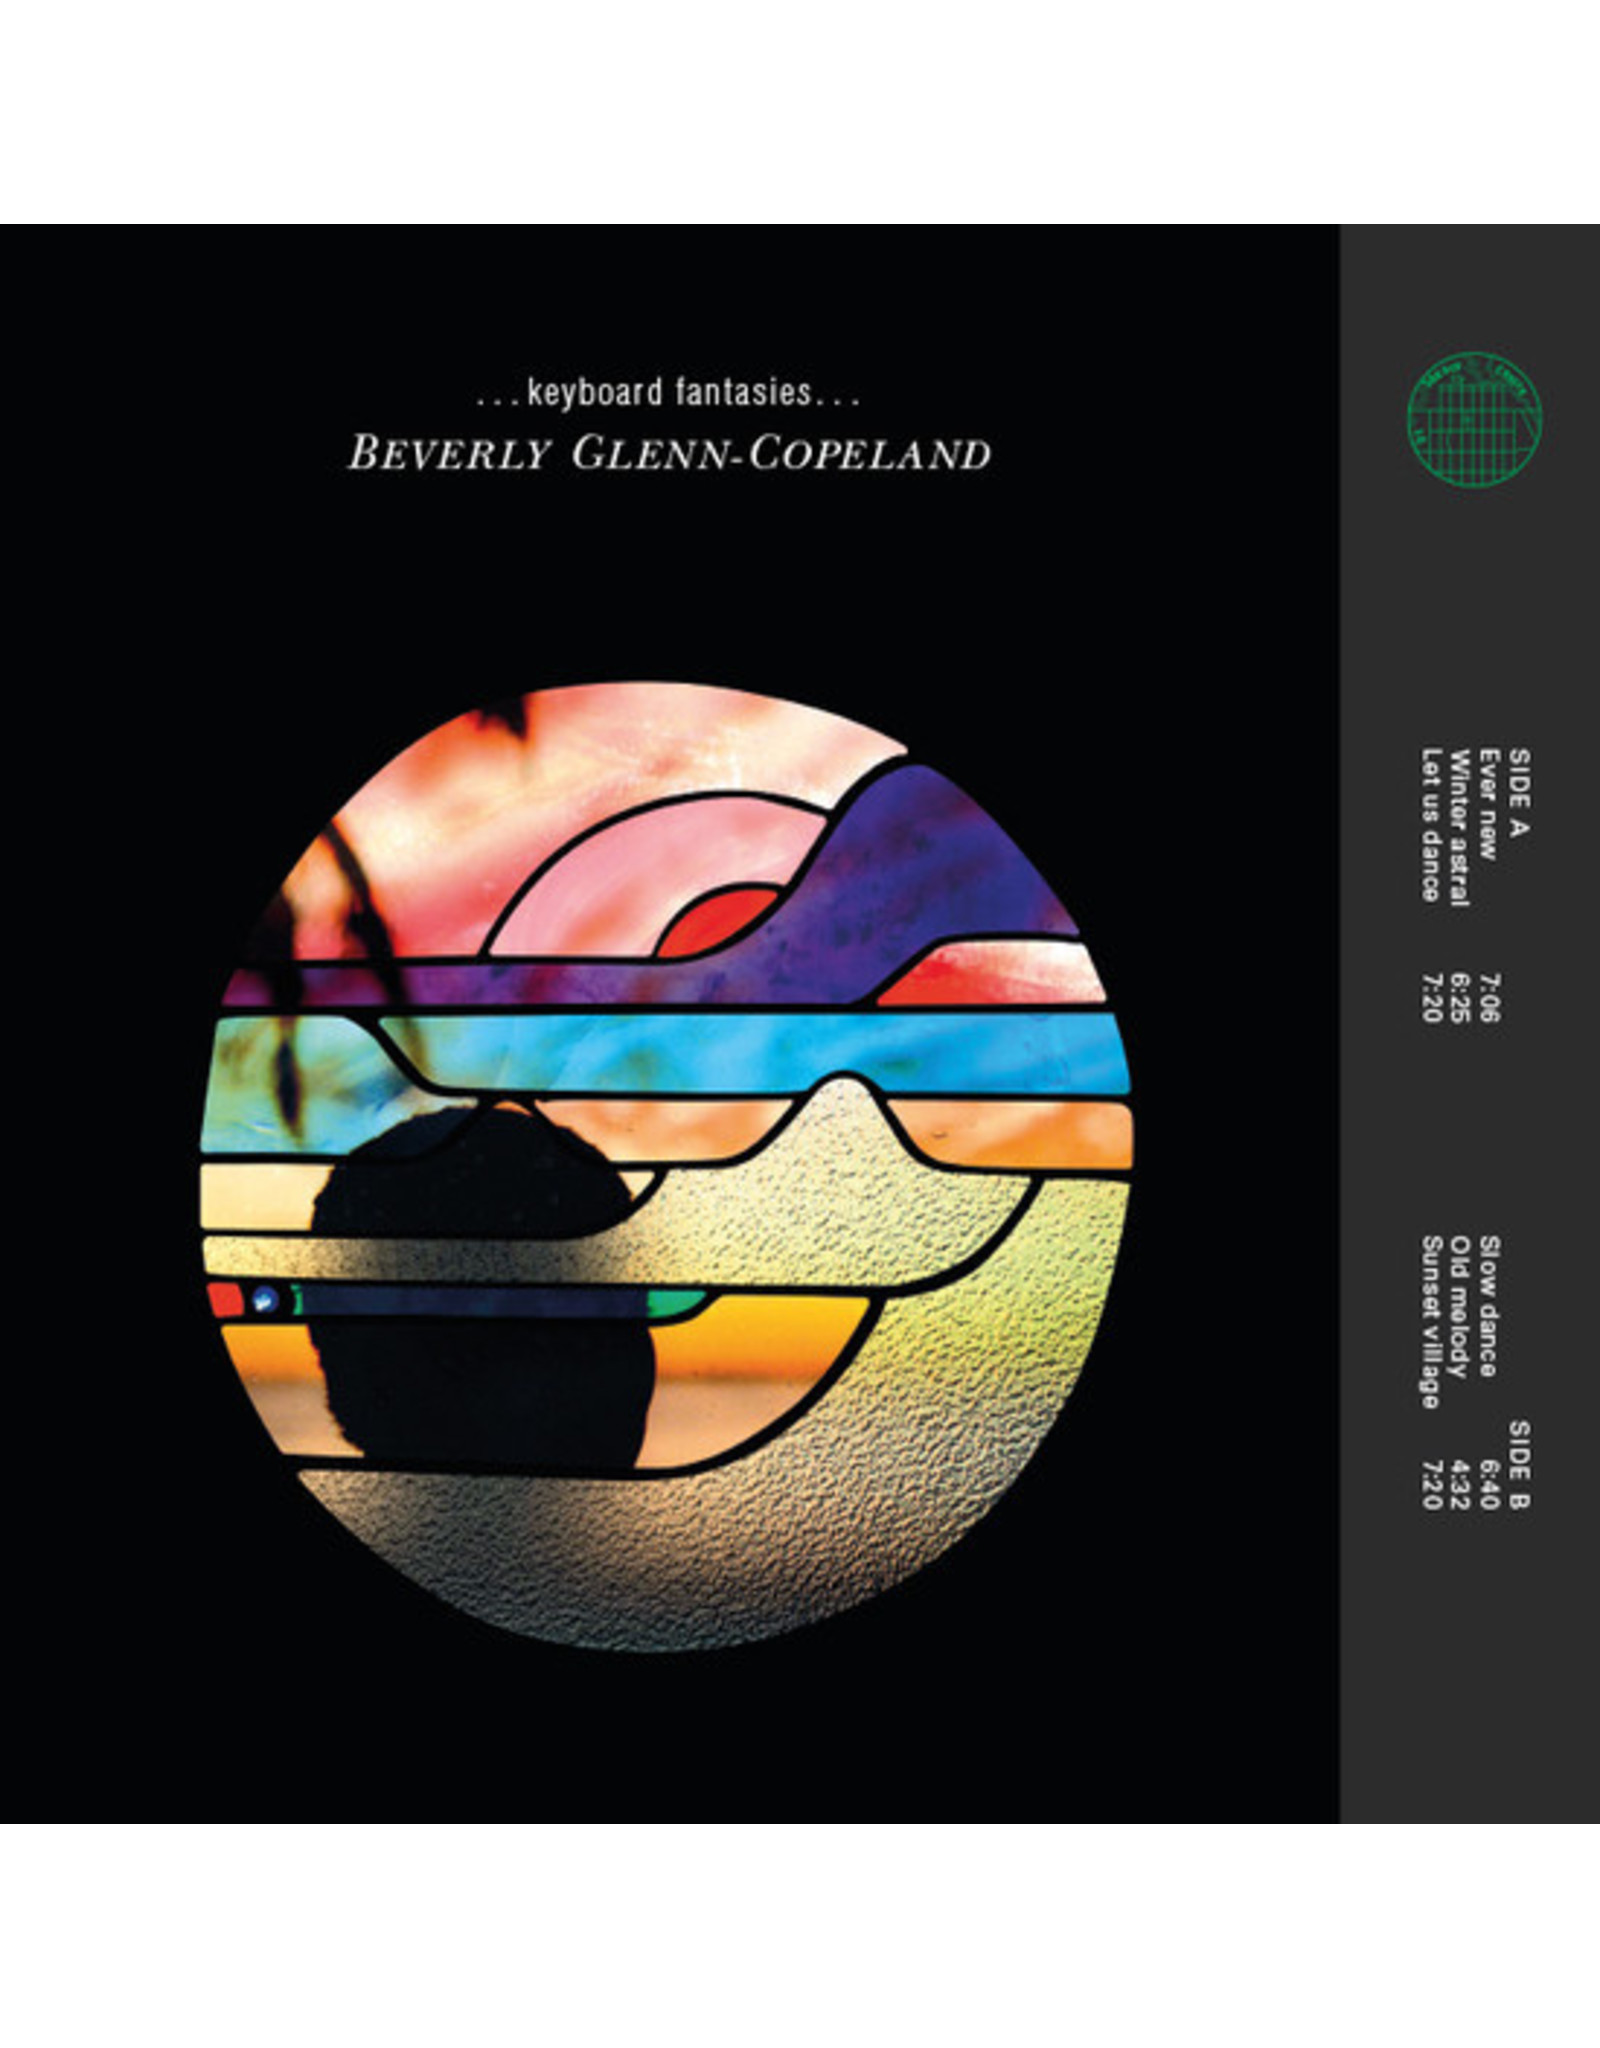 Seance Centre Glenn-Copeland, Beverly: Keyboard Fantasies LP